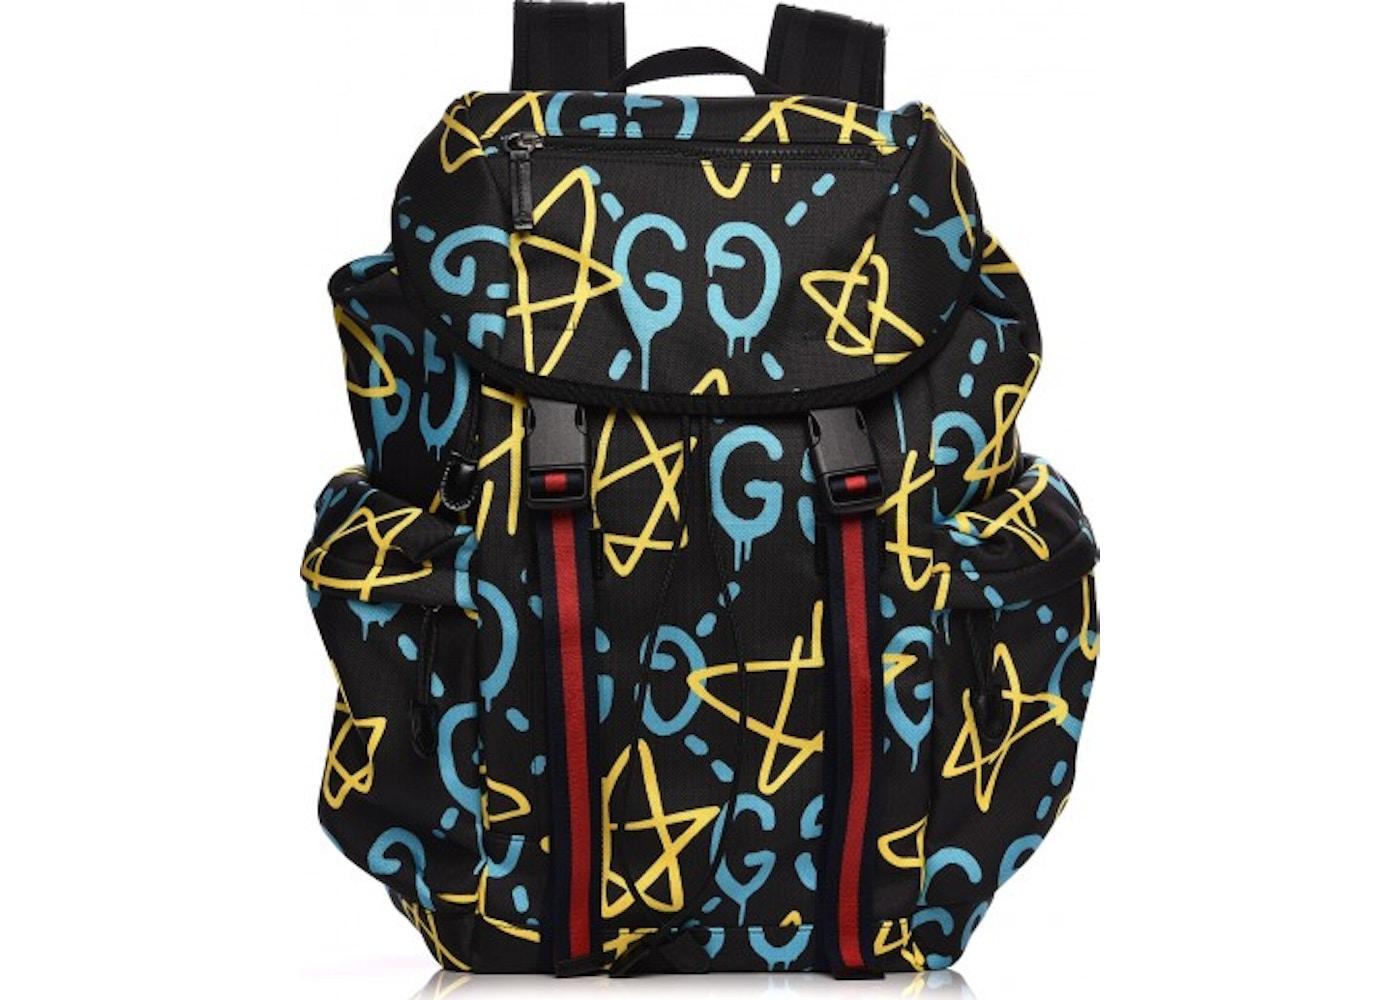 0e5e36ab2e9c4a Gucci Techpack Backpack GucciGhost. GucciGhost